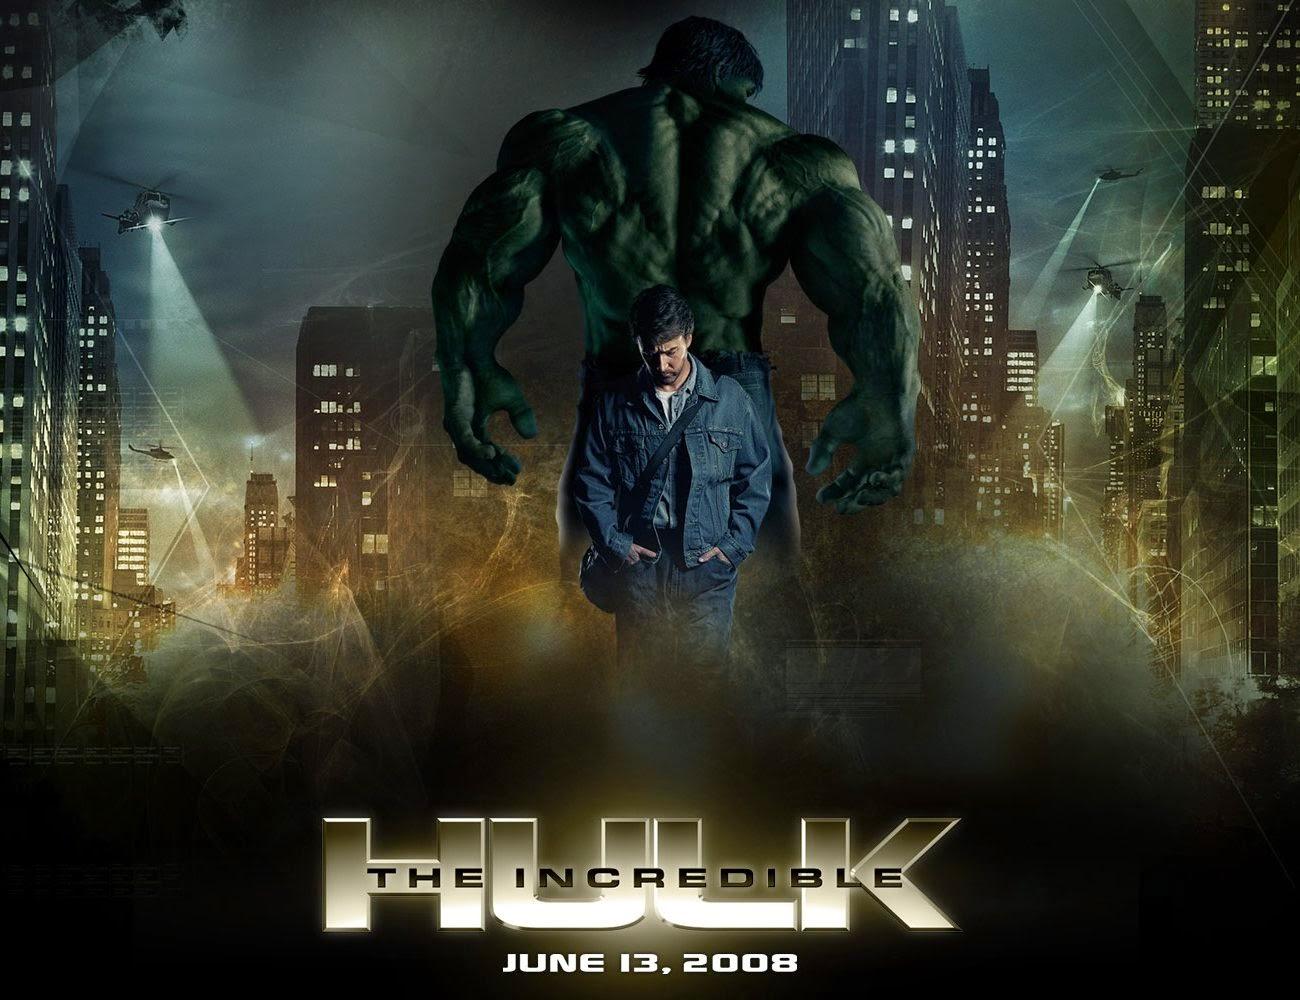 Hulk El increíble 2008 español latino descarga mega full hd marvel